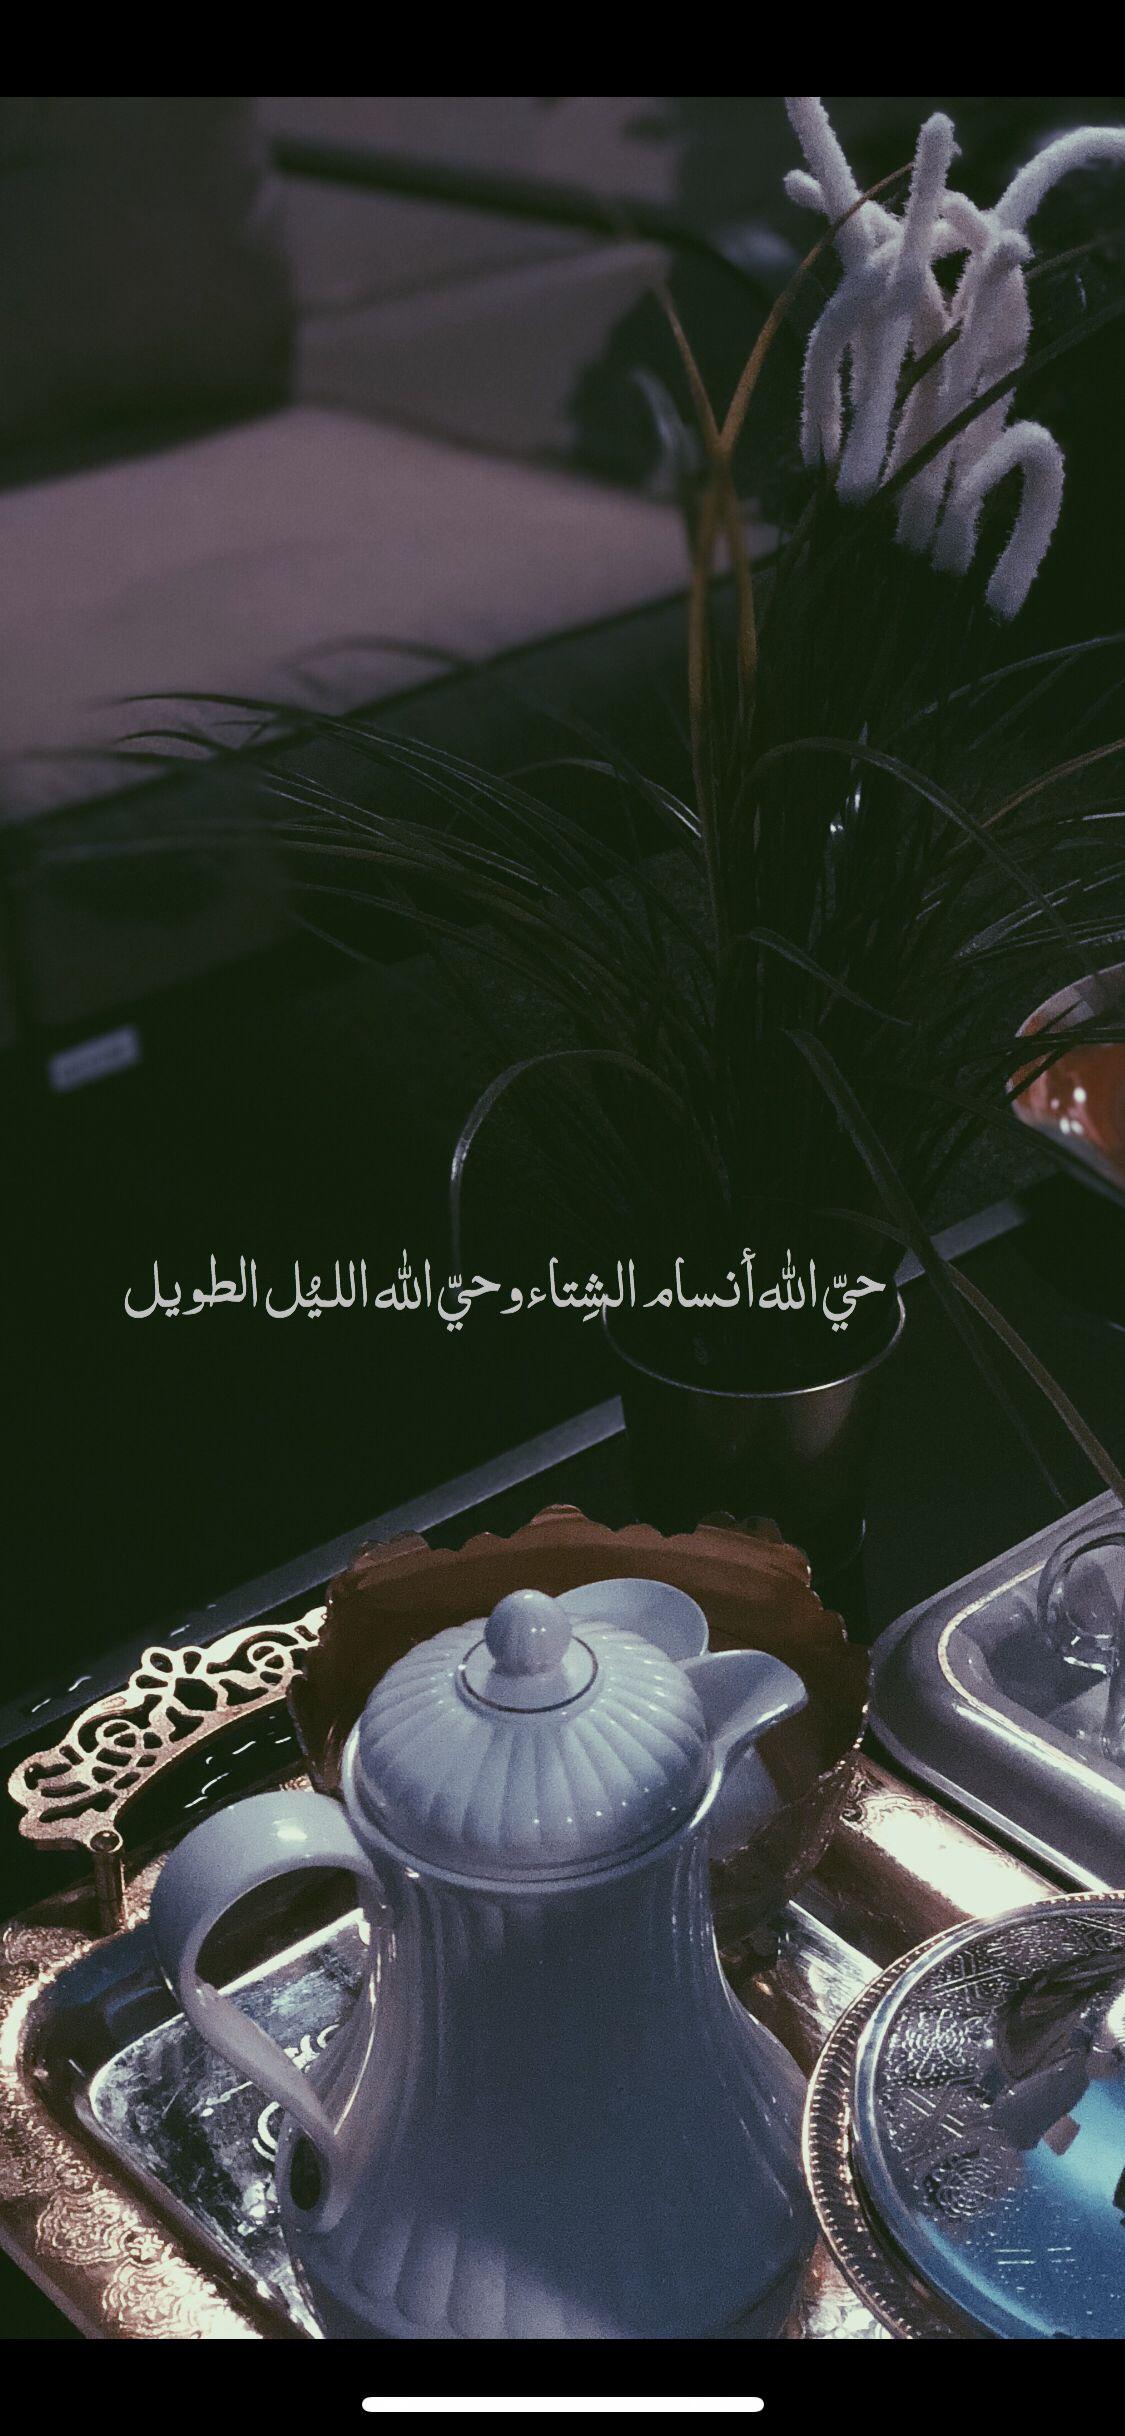 حي الله الليل الطويل Beautiful Arabic Words Funny Arabic Quotes Romantic Words